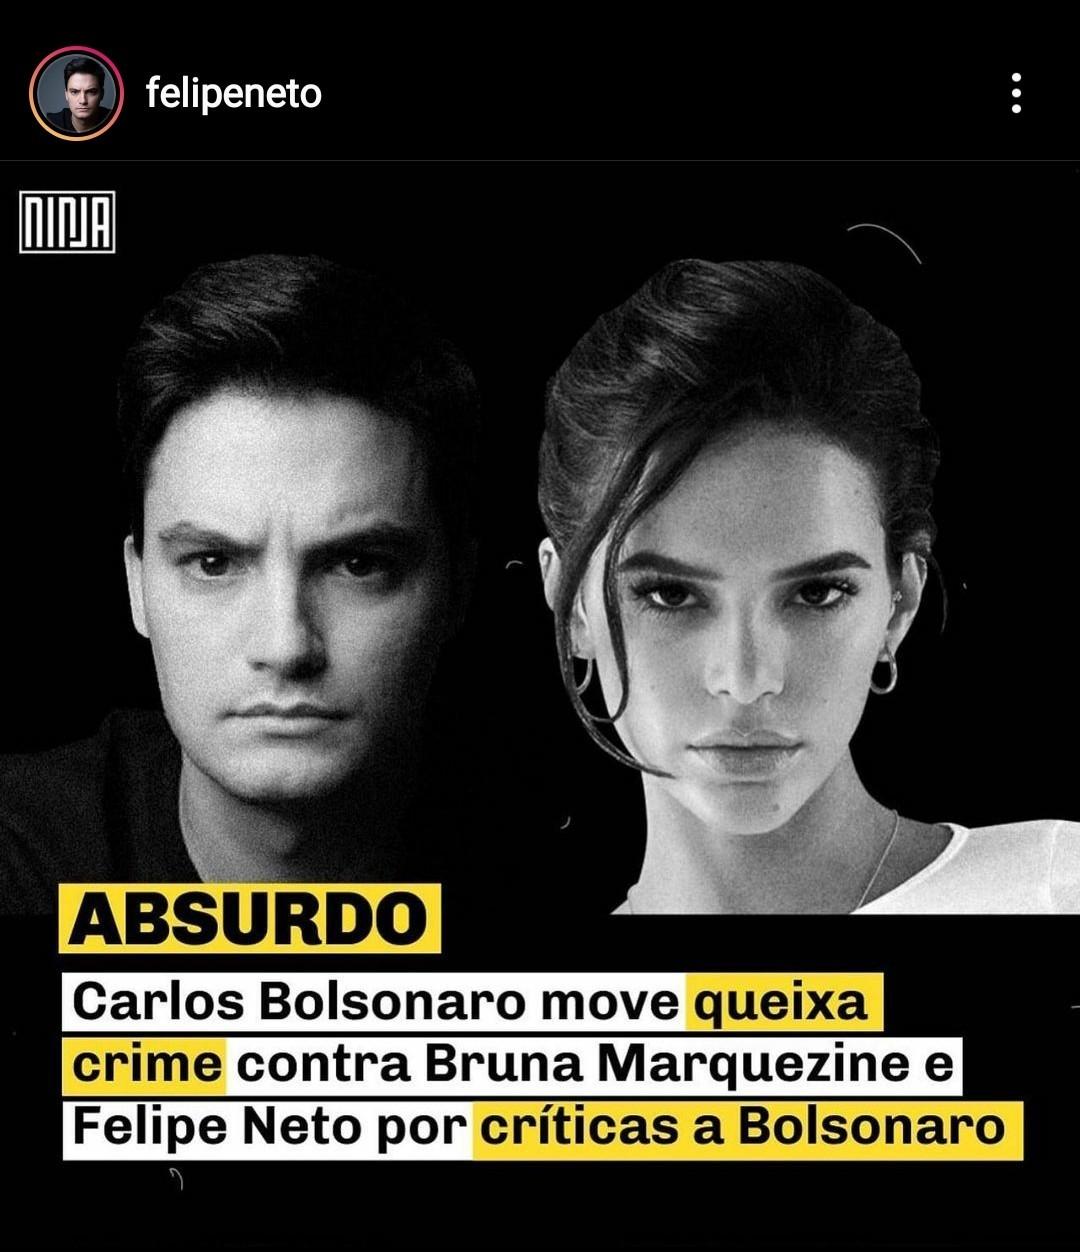 Felipe Neto e Bruna Marquezine